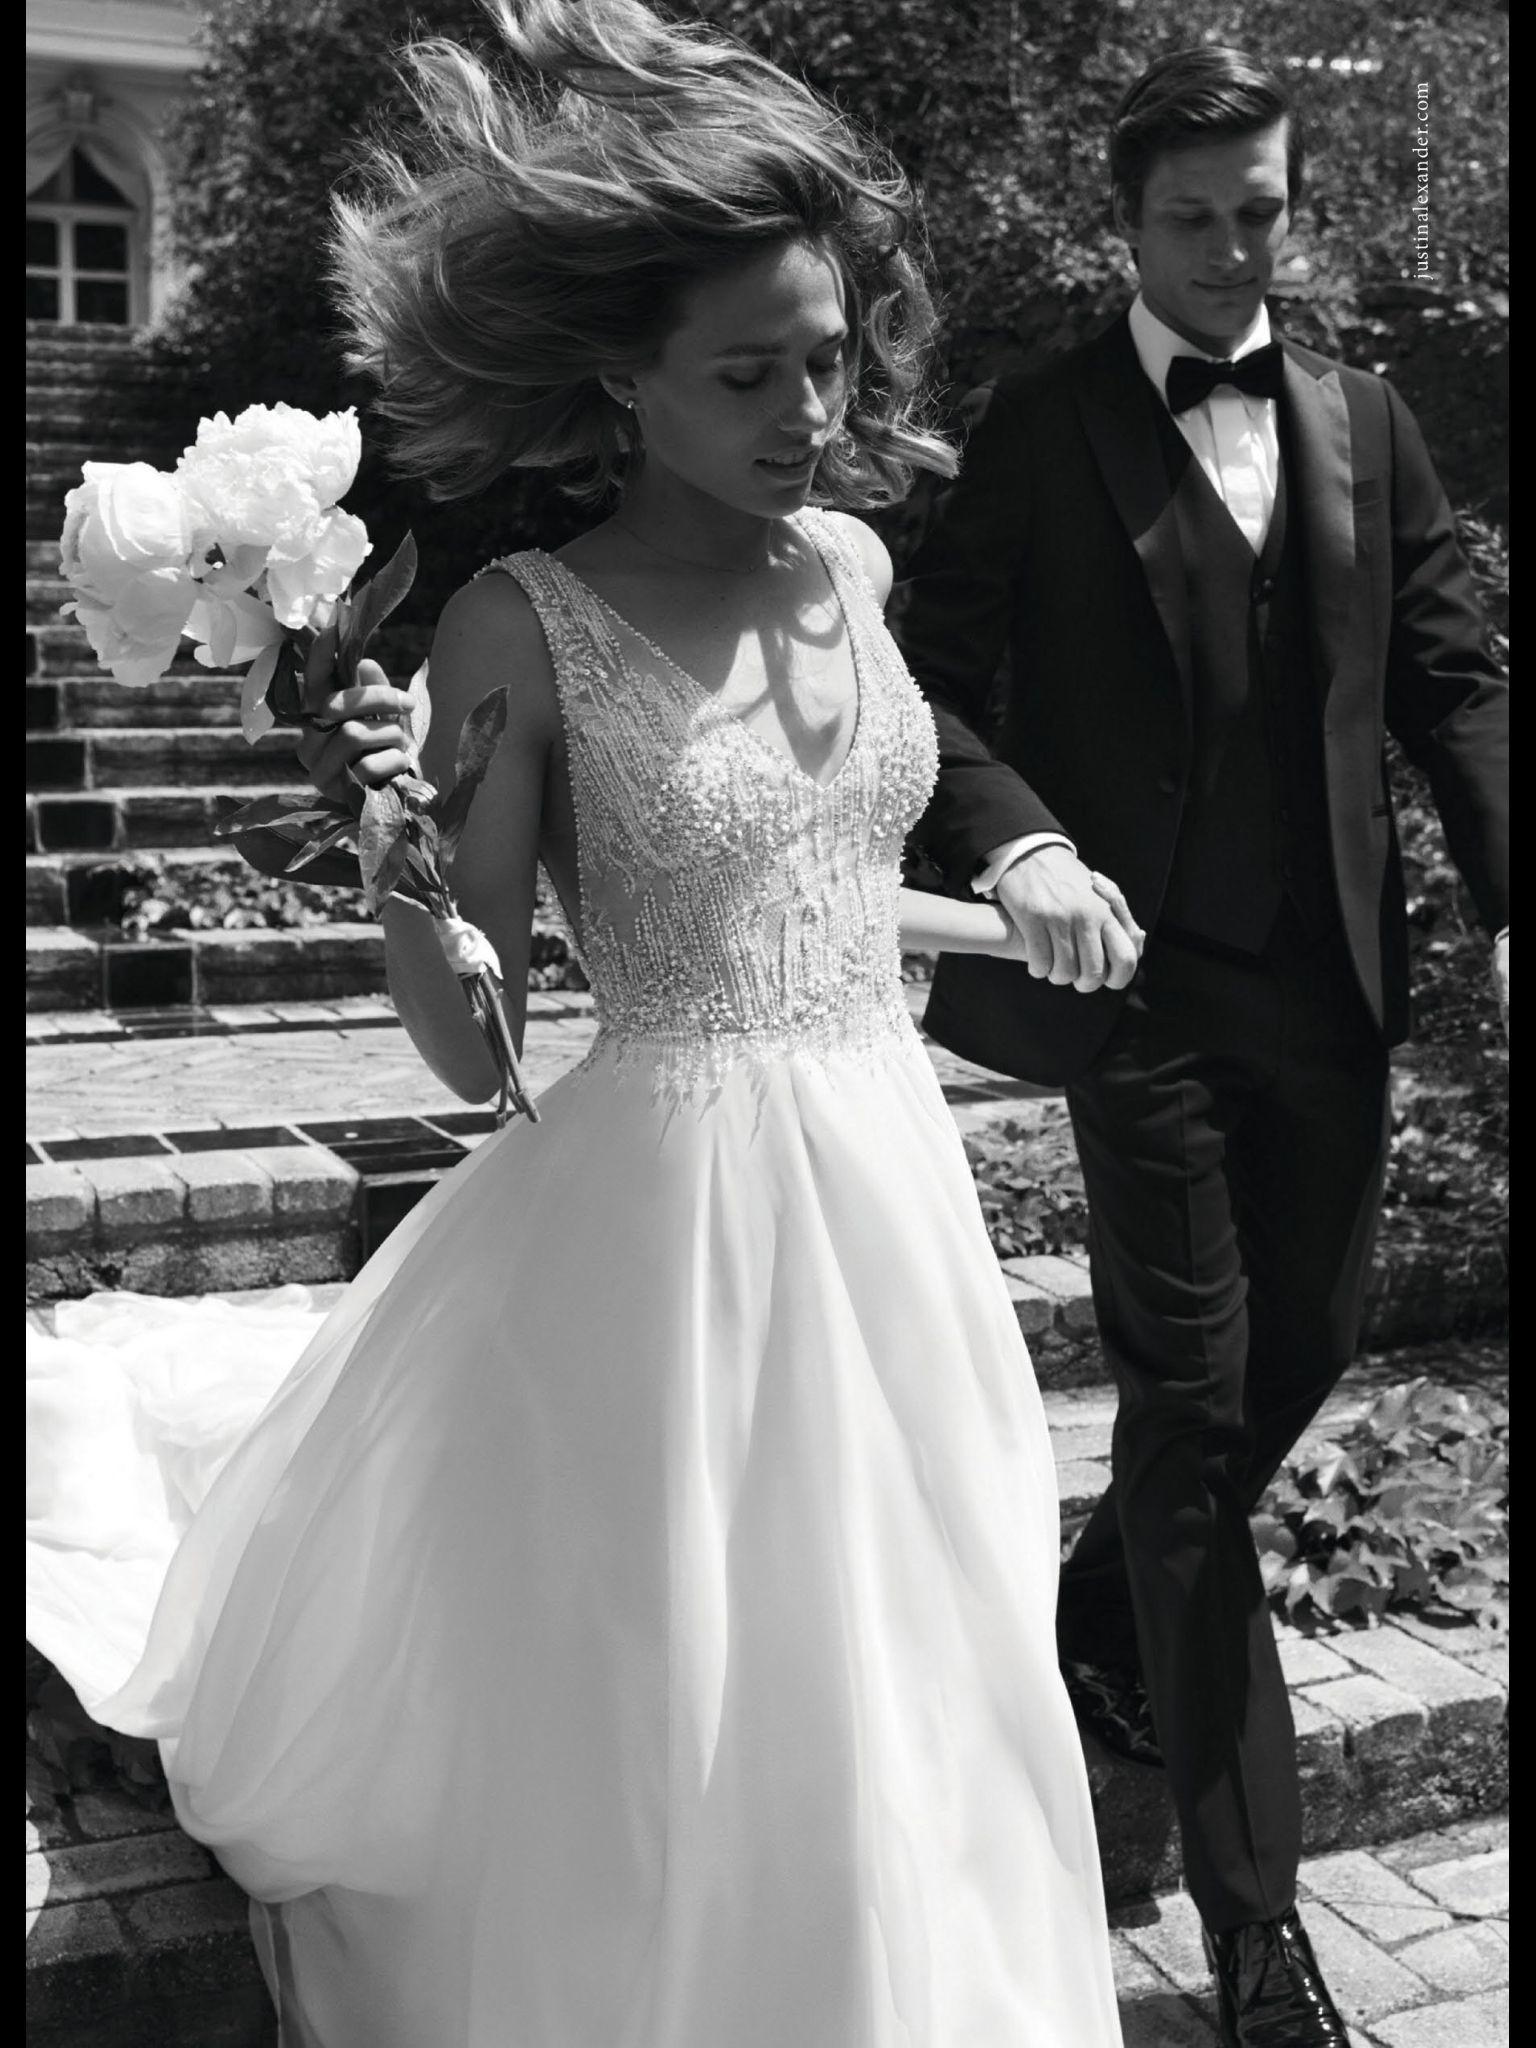 Lace wedding dress under 200 november 2018 Cover